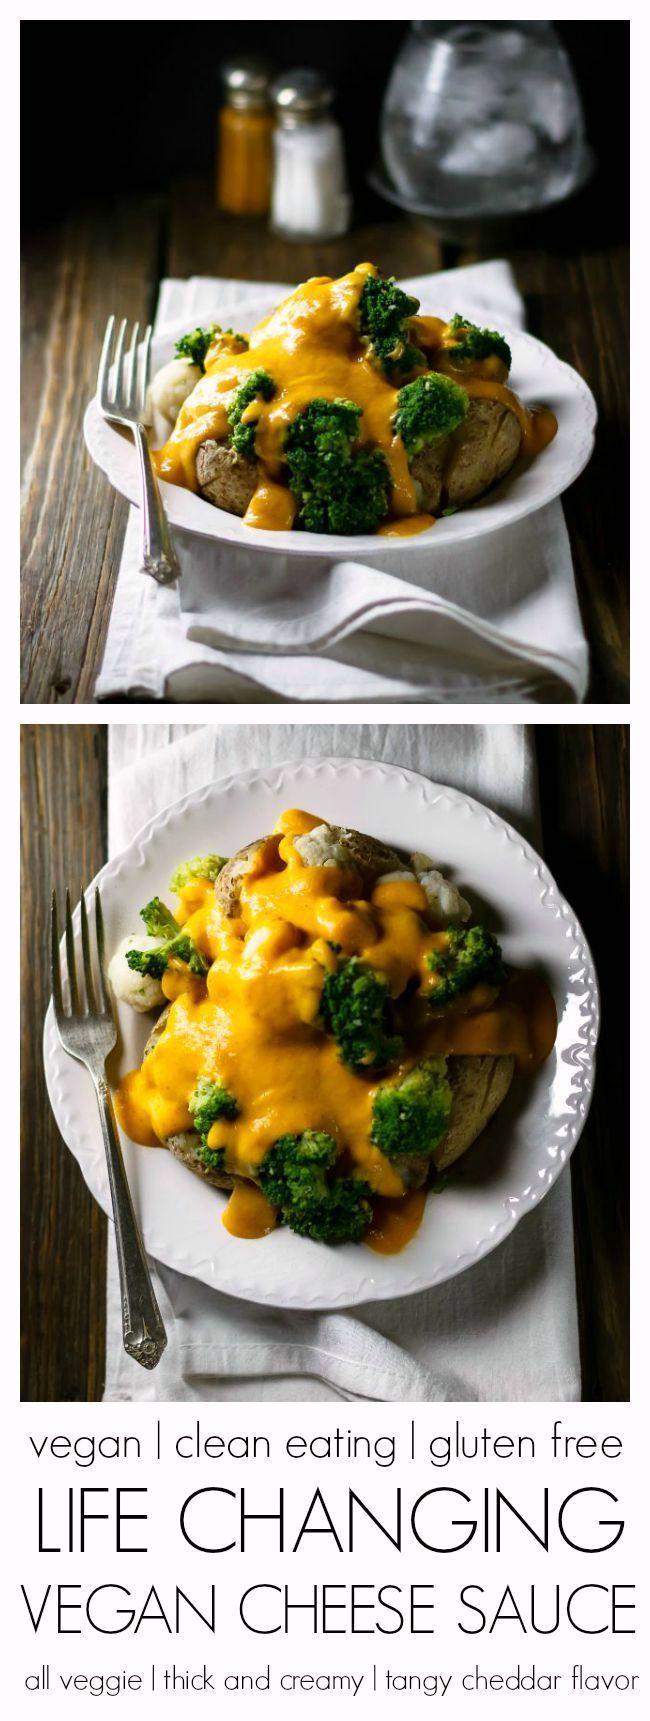 Life Changing Vegan Cheese Sauce